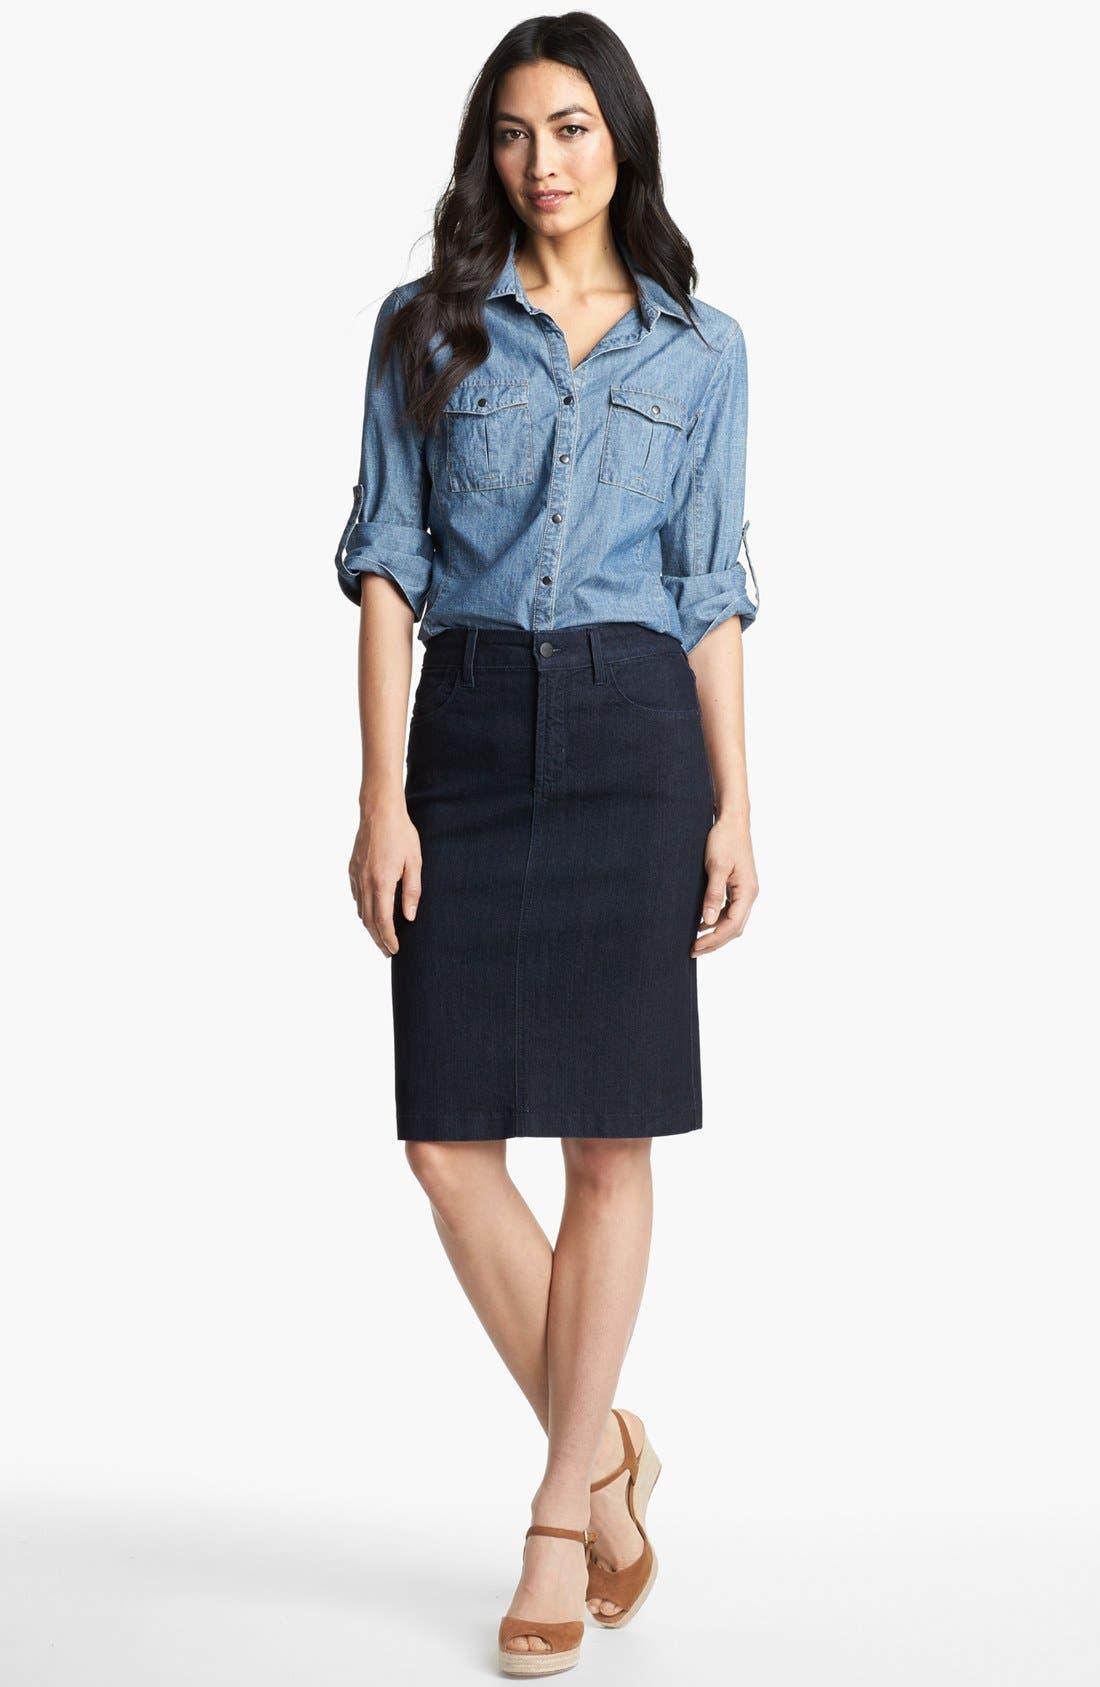 Alternate Image 1 Selected - Nexx Denim Shirt & NYDJ 'Emma' Skirt